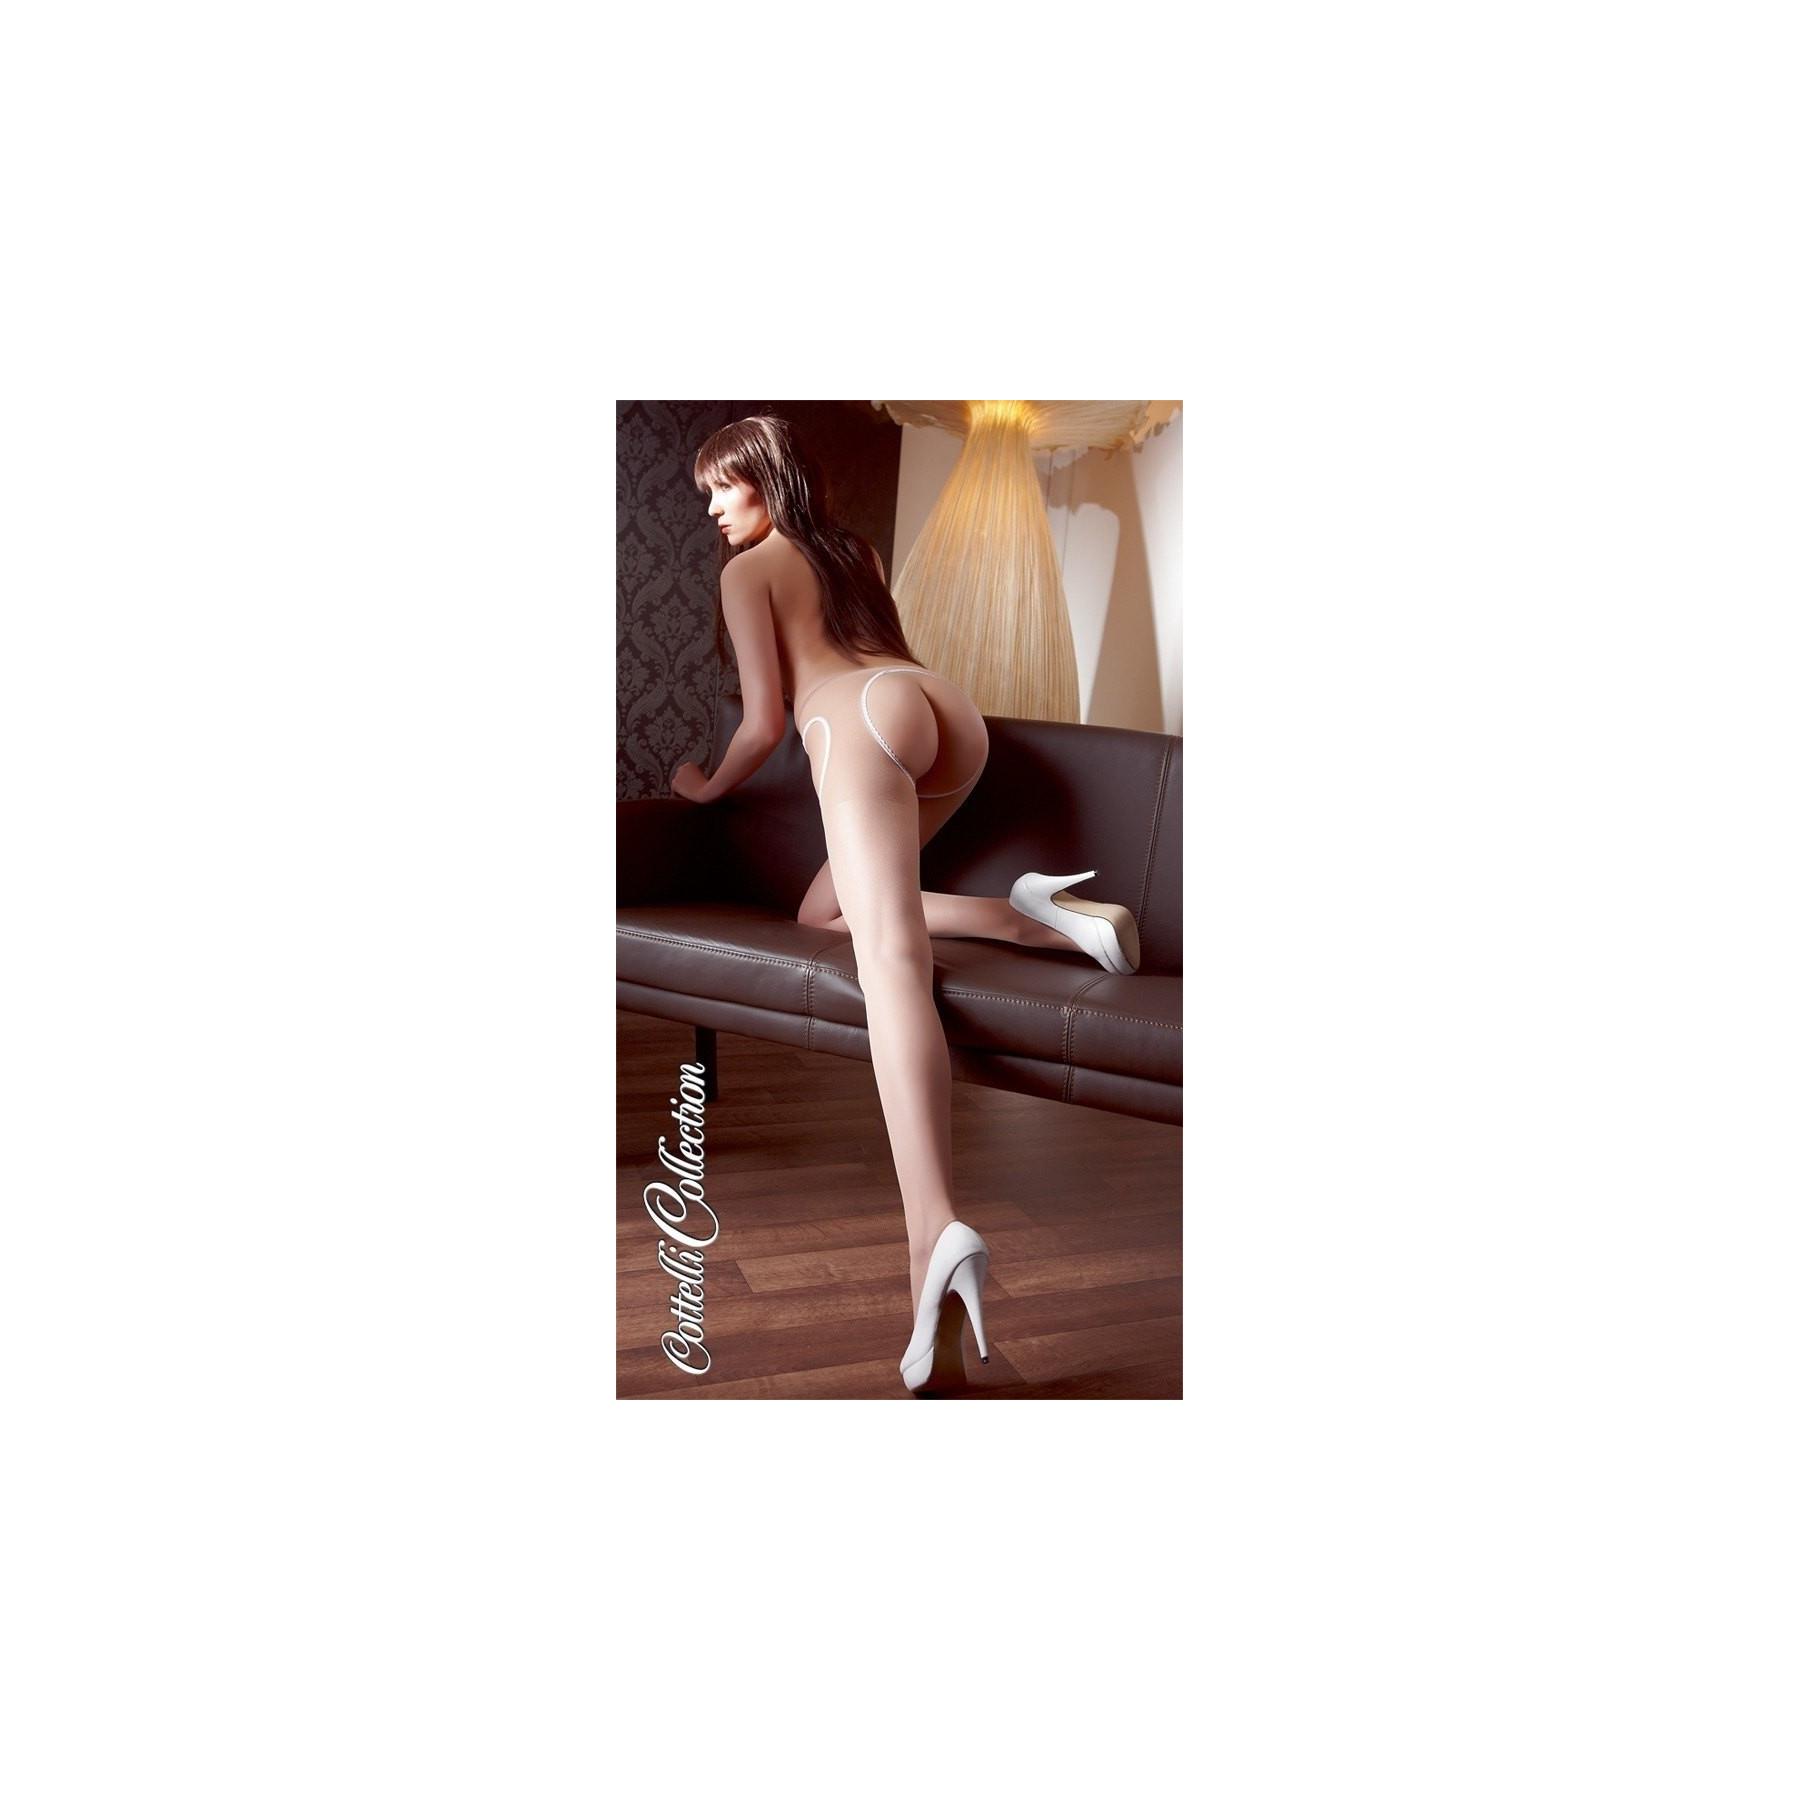 Collant ouvert nude calze con apertura Cottelli